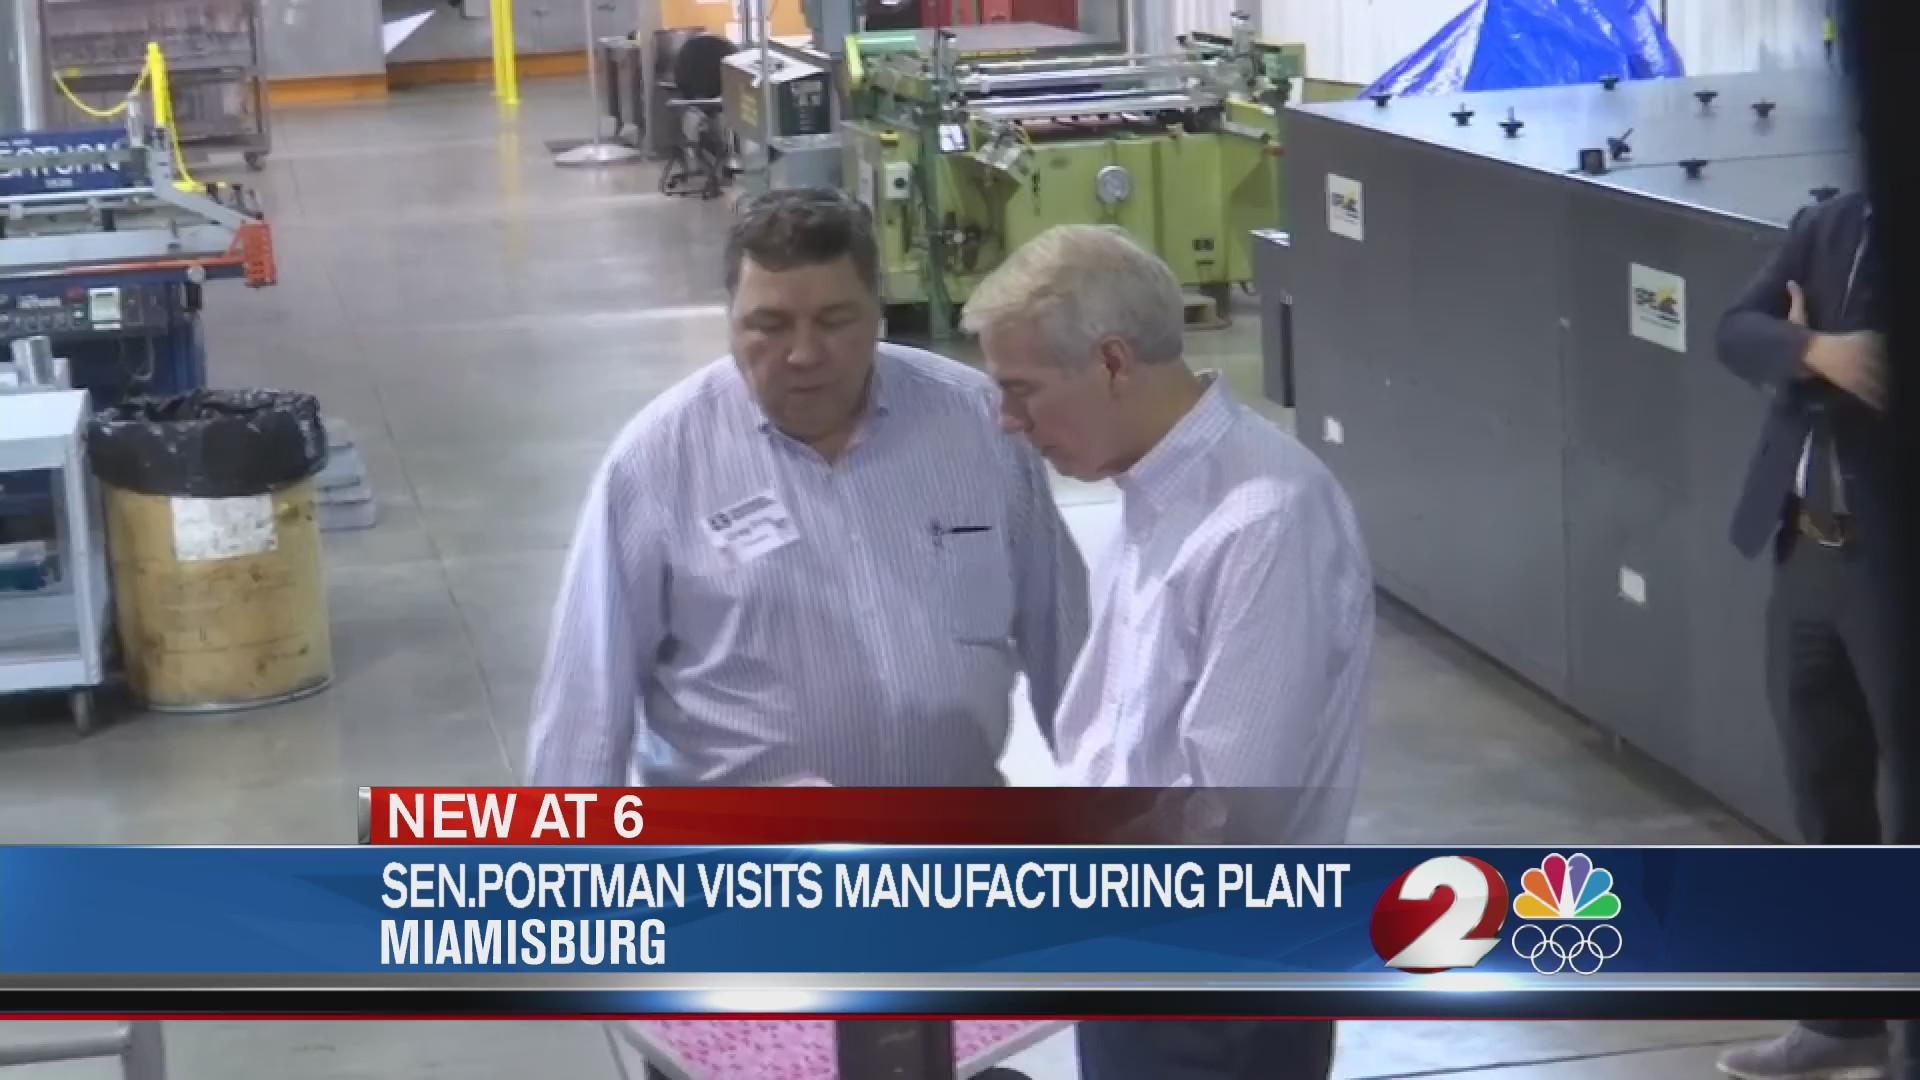 Sen. Portman visits manufacturing plant